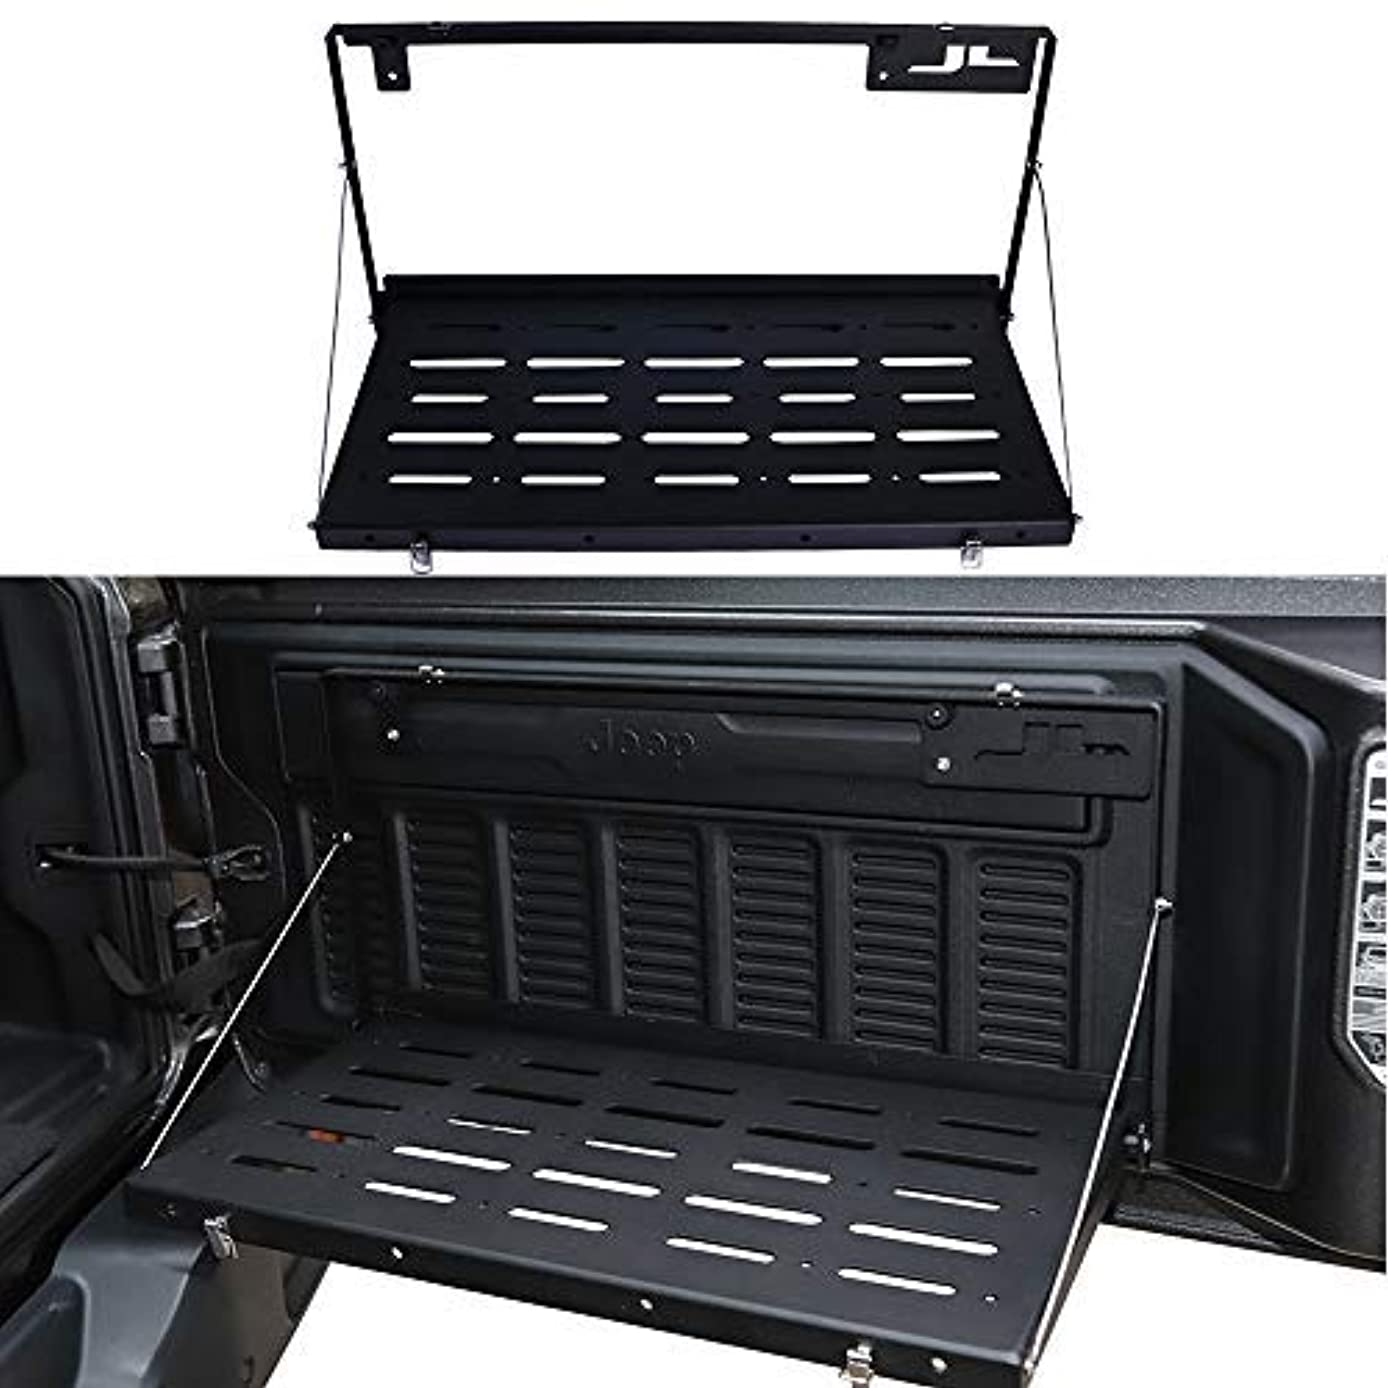 HEQIANG Aluminium Alloy Matte Black Flexible Foldable Tailgate Table Rear Trunk Door Rack Cargo Luggage Holder Carrier Back Shelf for Jeep Wrangler JL JLU 2018 (Instruction Included)